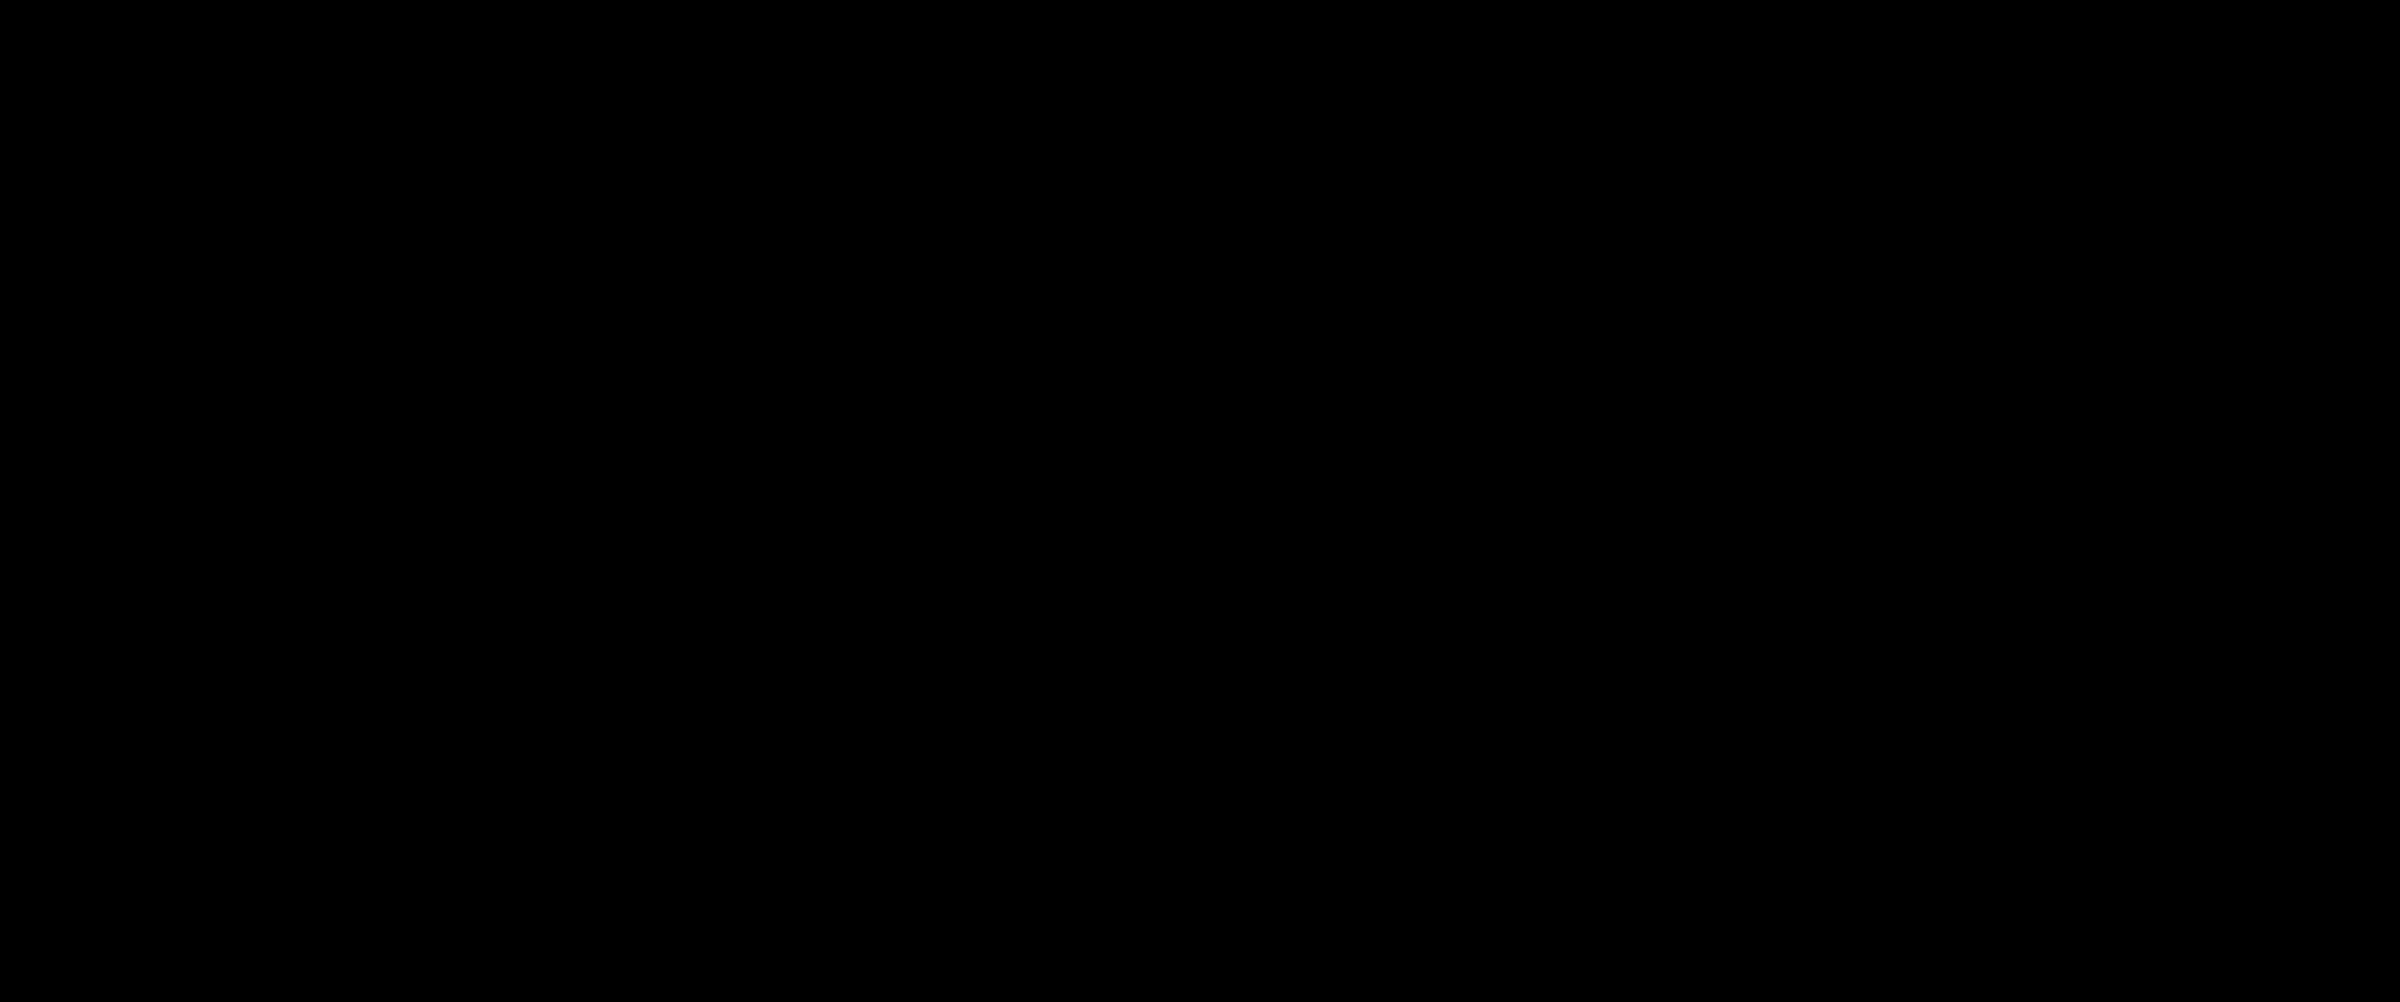 2400x1002 Clipart